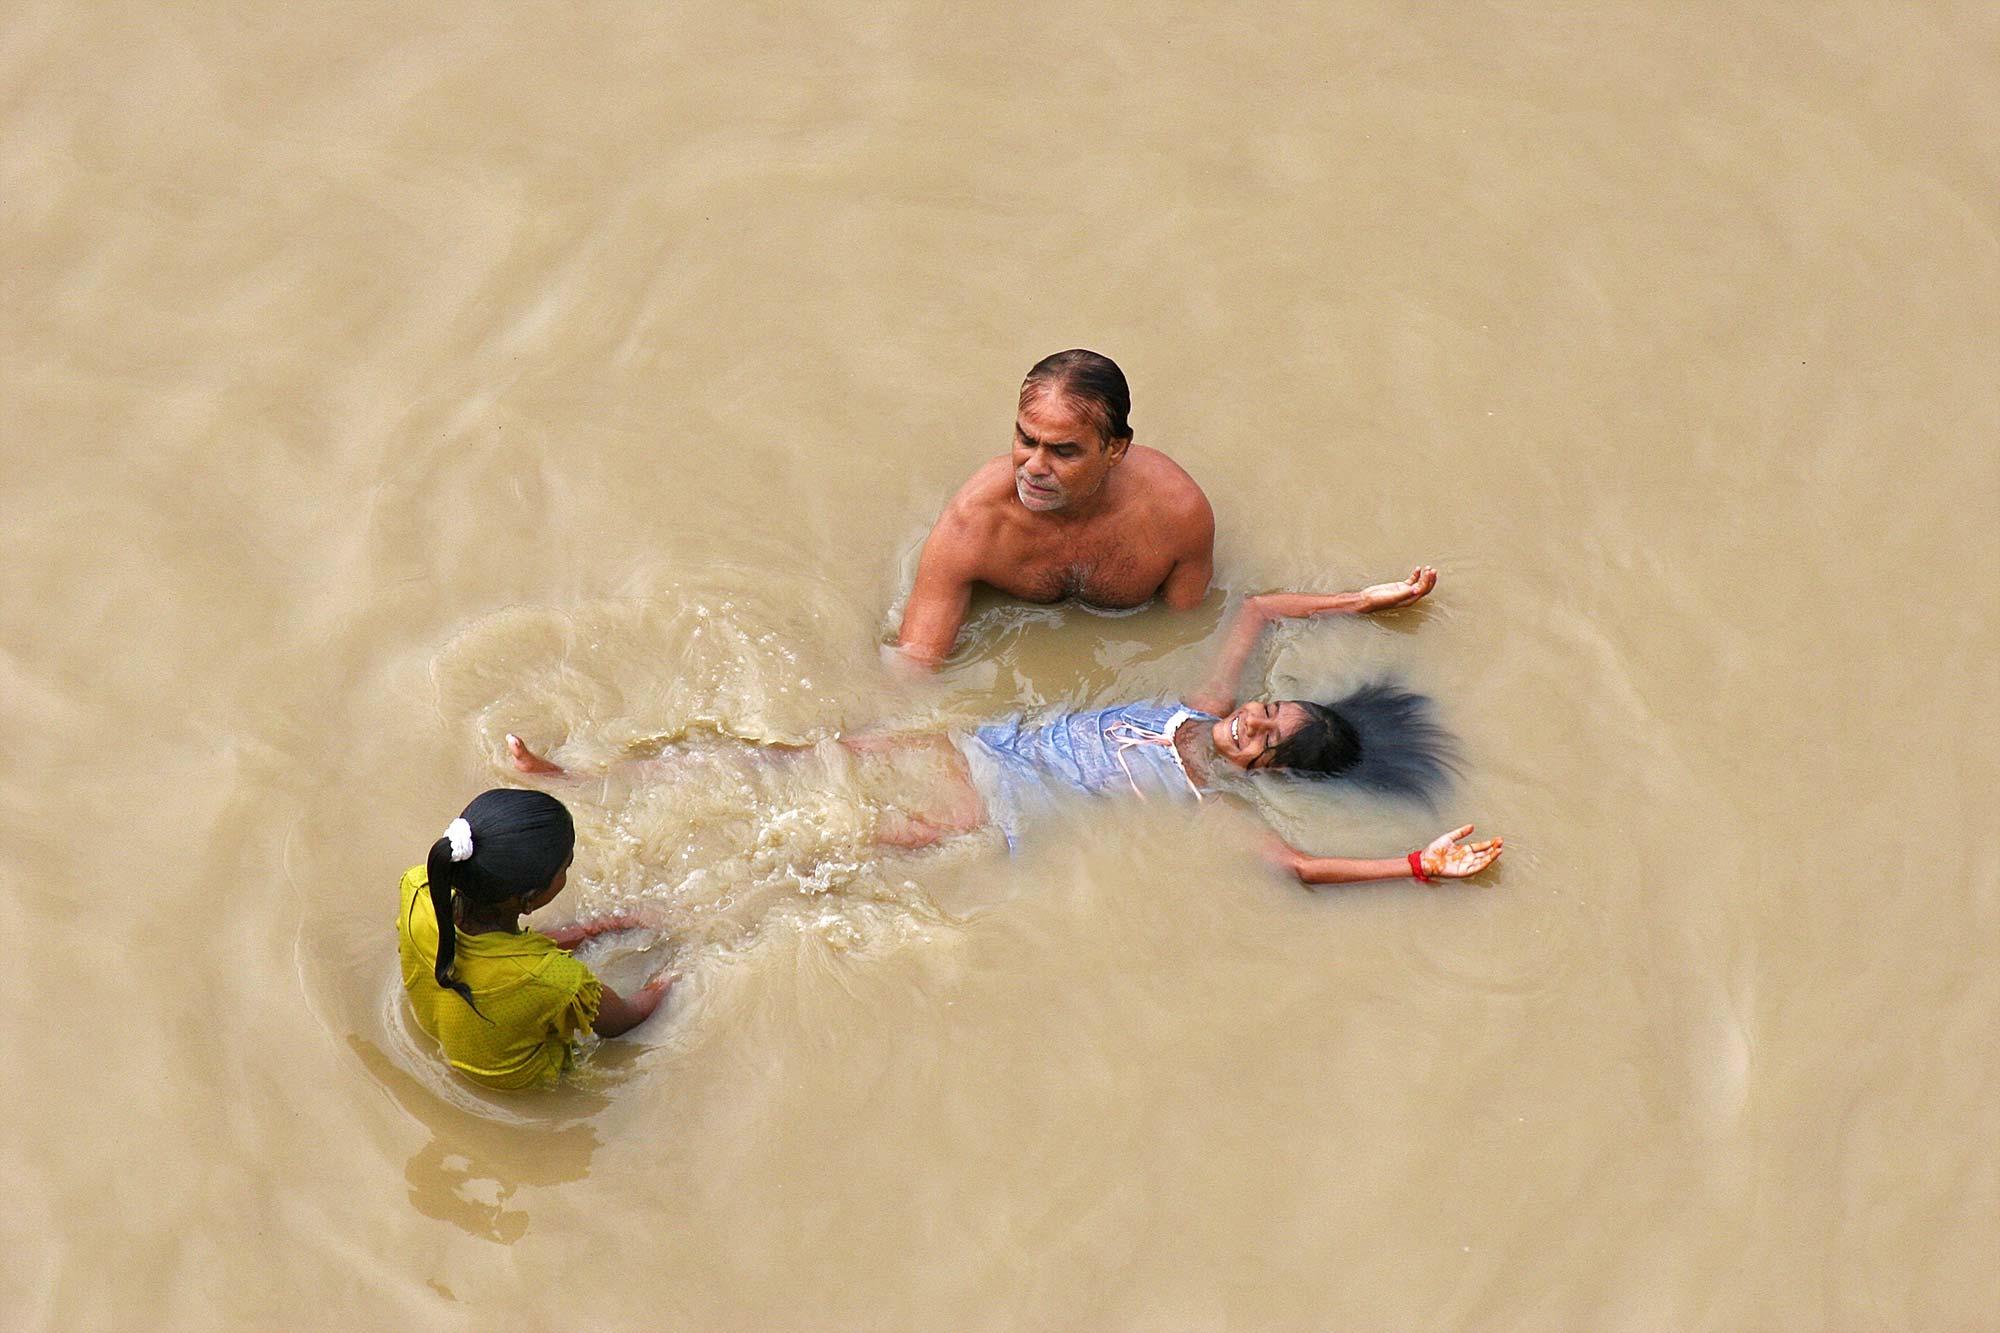 family-shores-ganges-varanasi-india